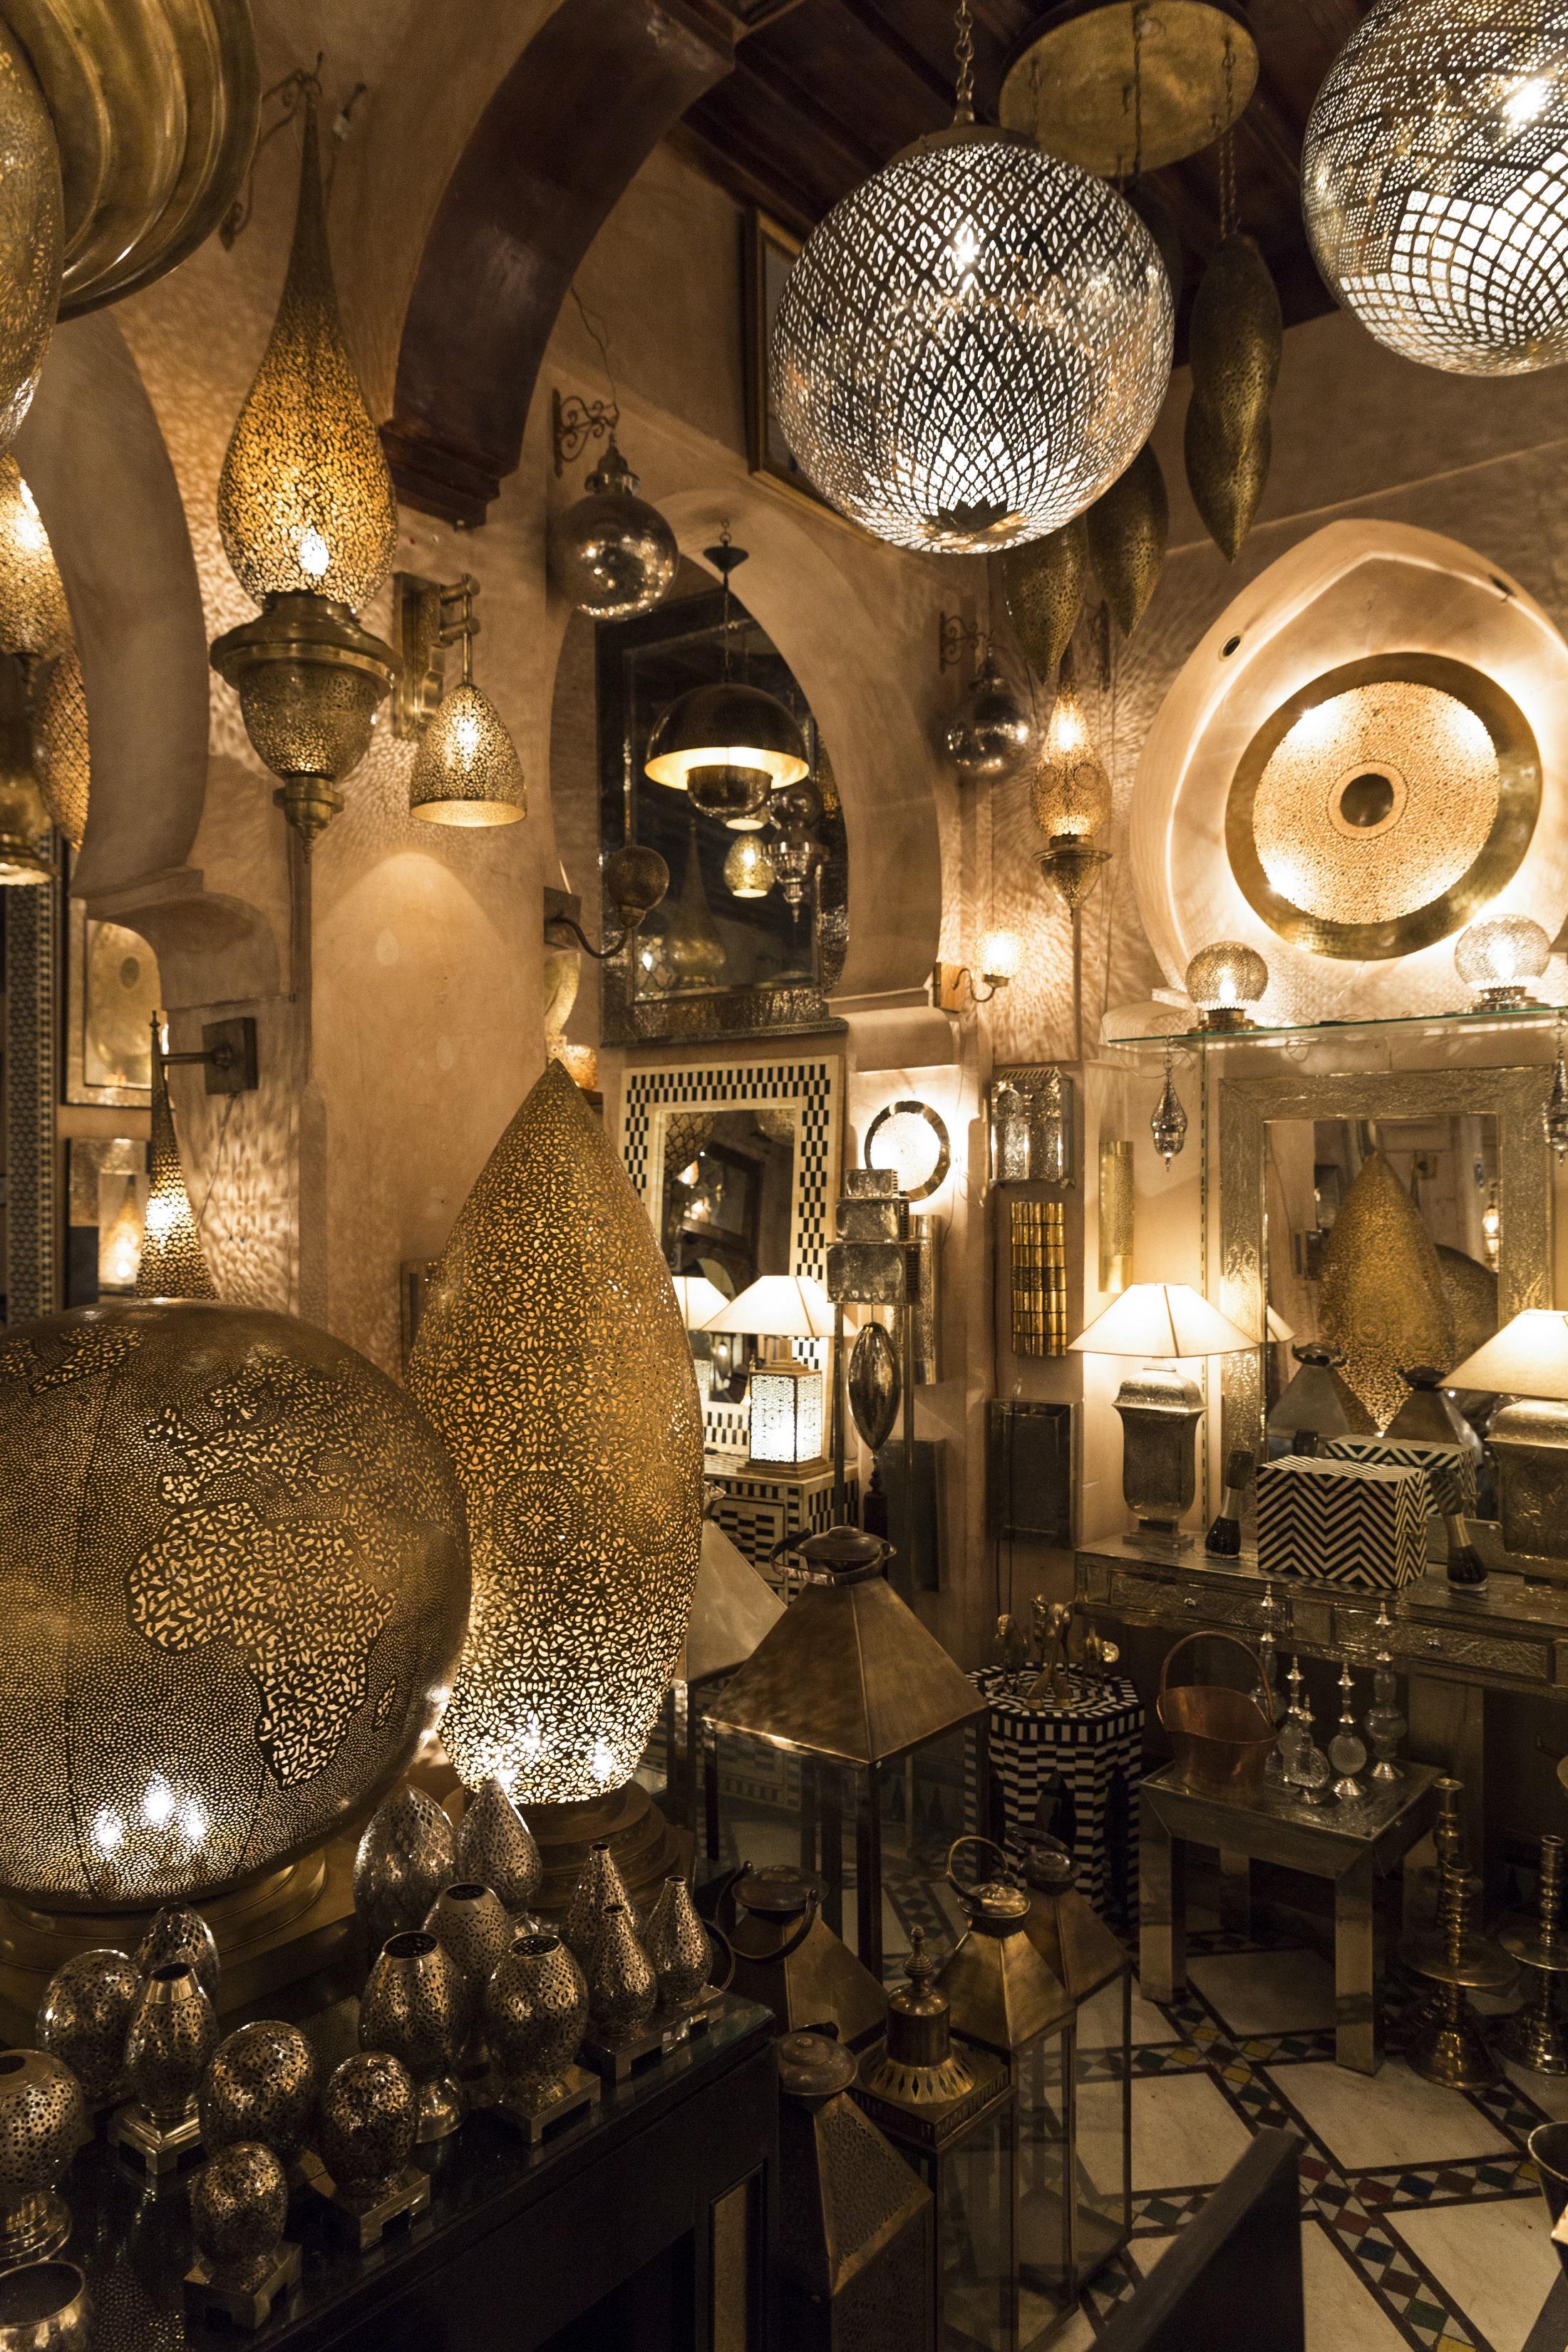 lampade_a_marrakesh_bianche